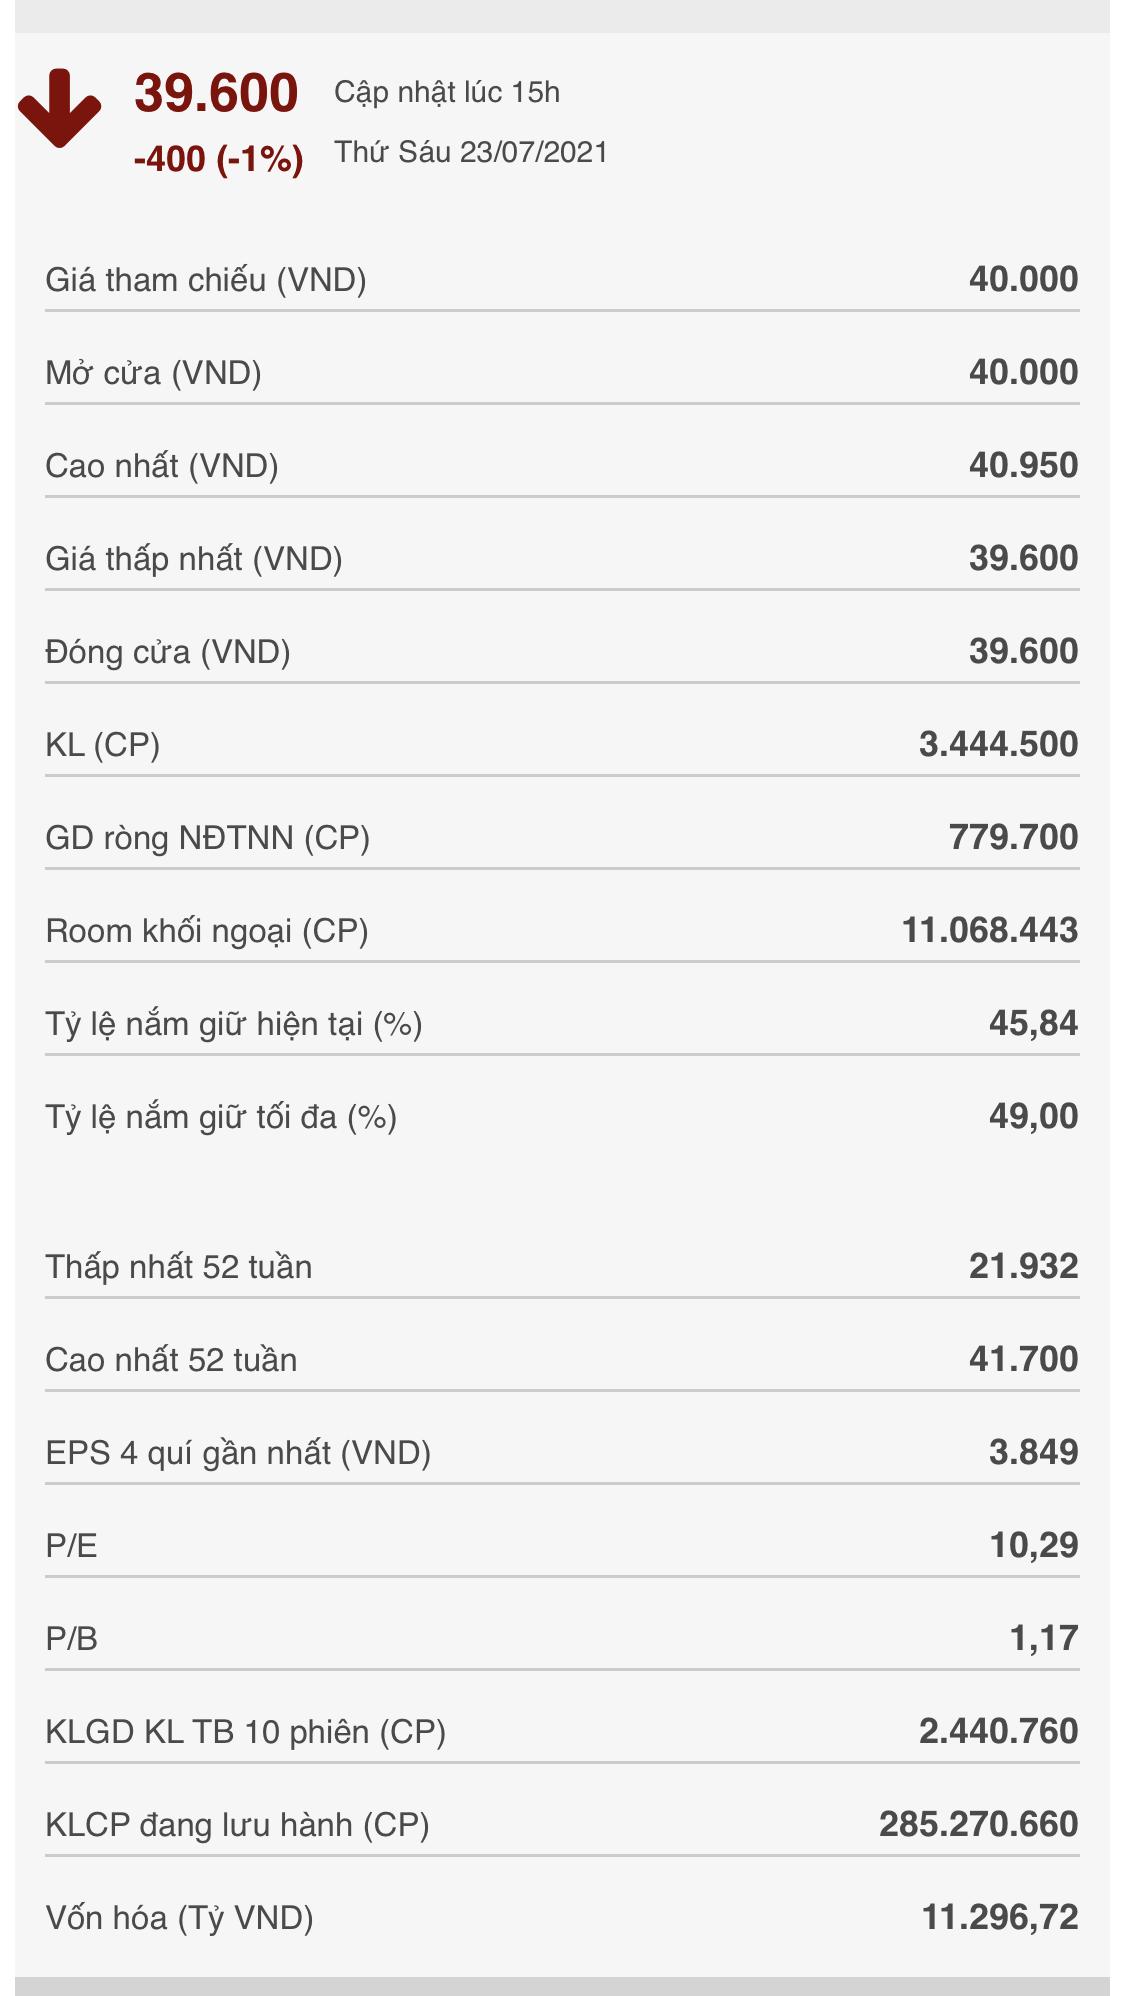 nlg-doanh-nghiep-1627101534.png